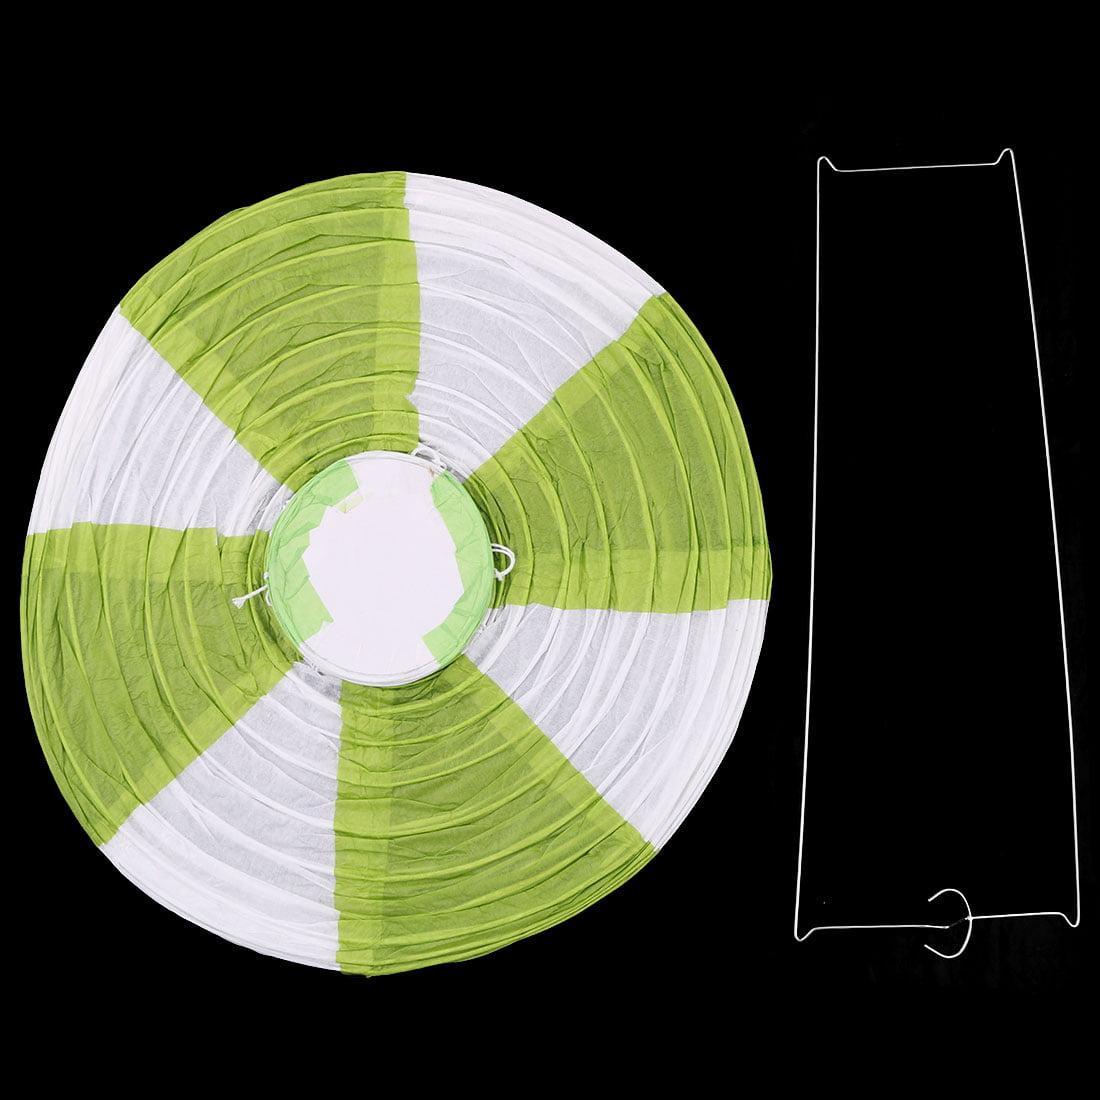 Festival Party Paper DIY Handmade Lightless Hot Air Balloon Lantern Green White - image 4 of 6